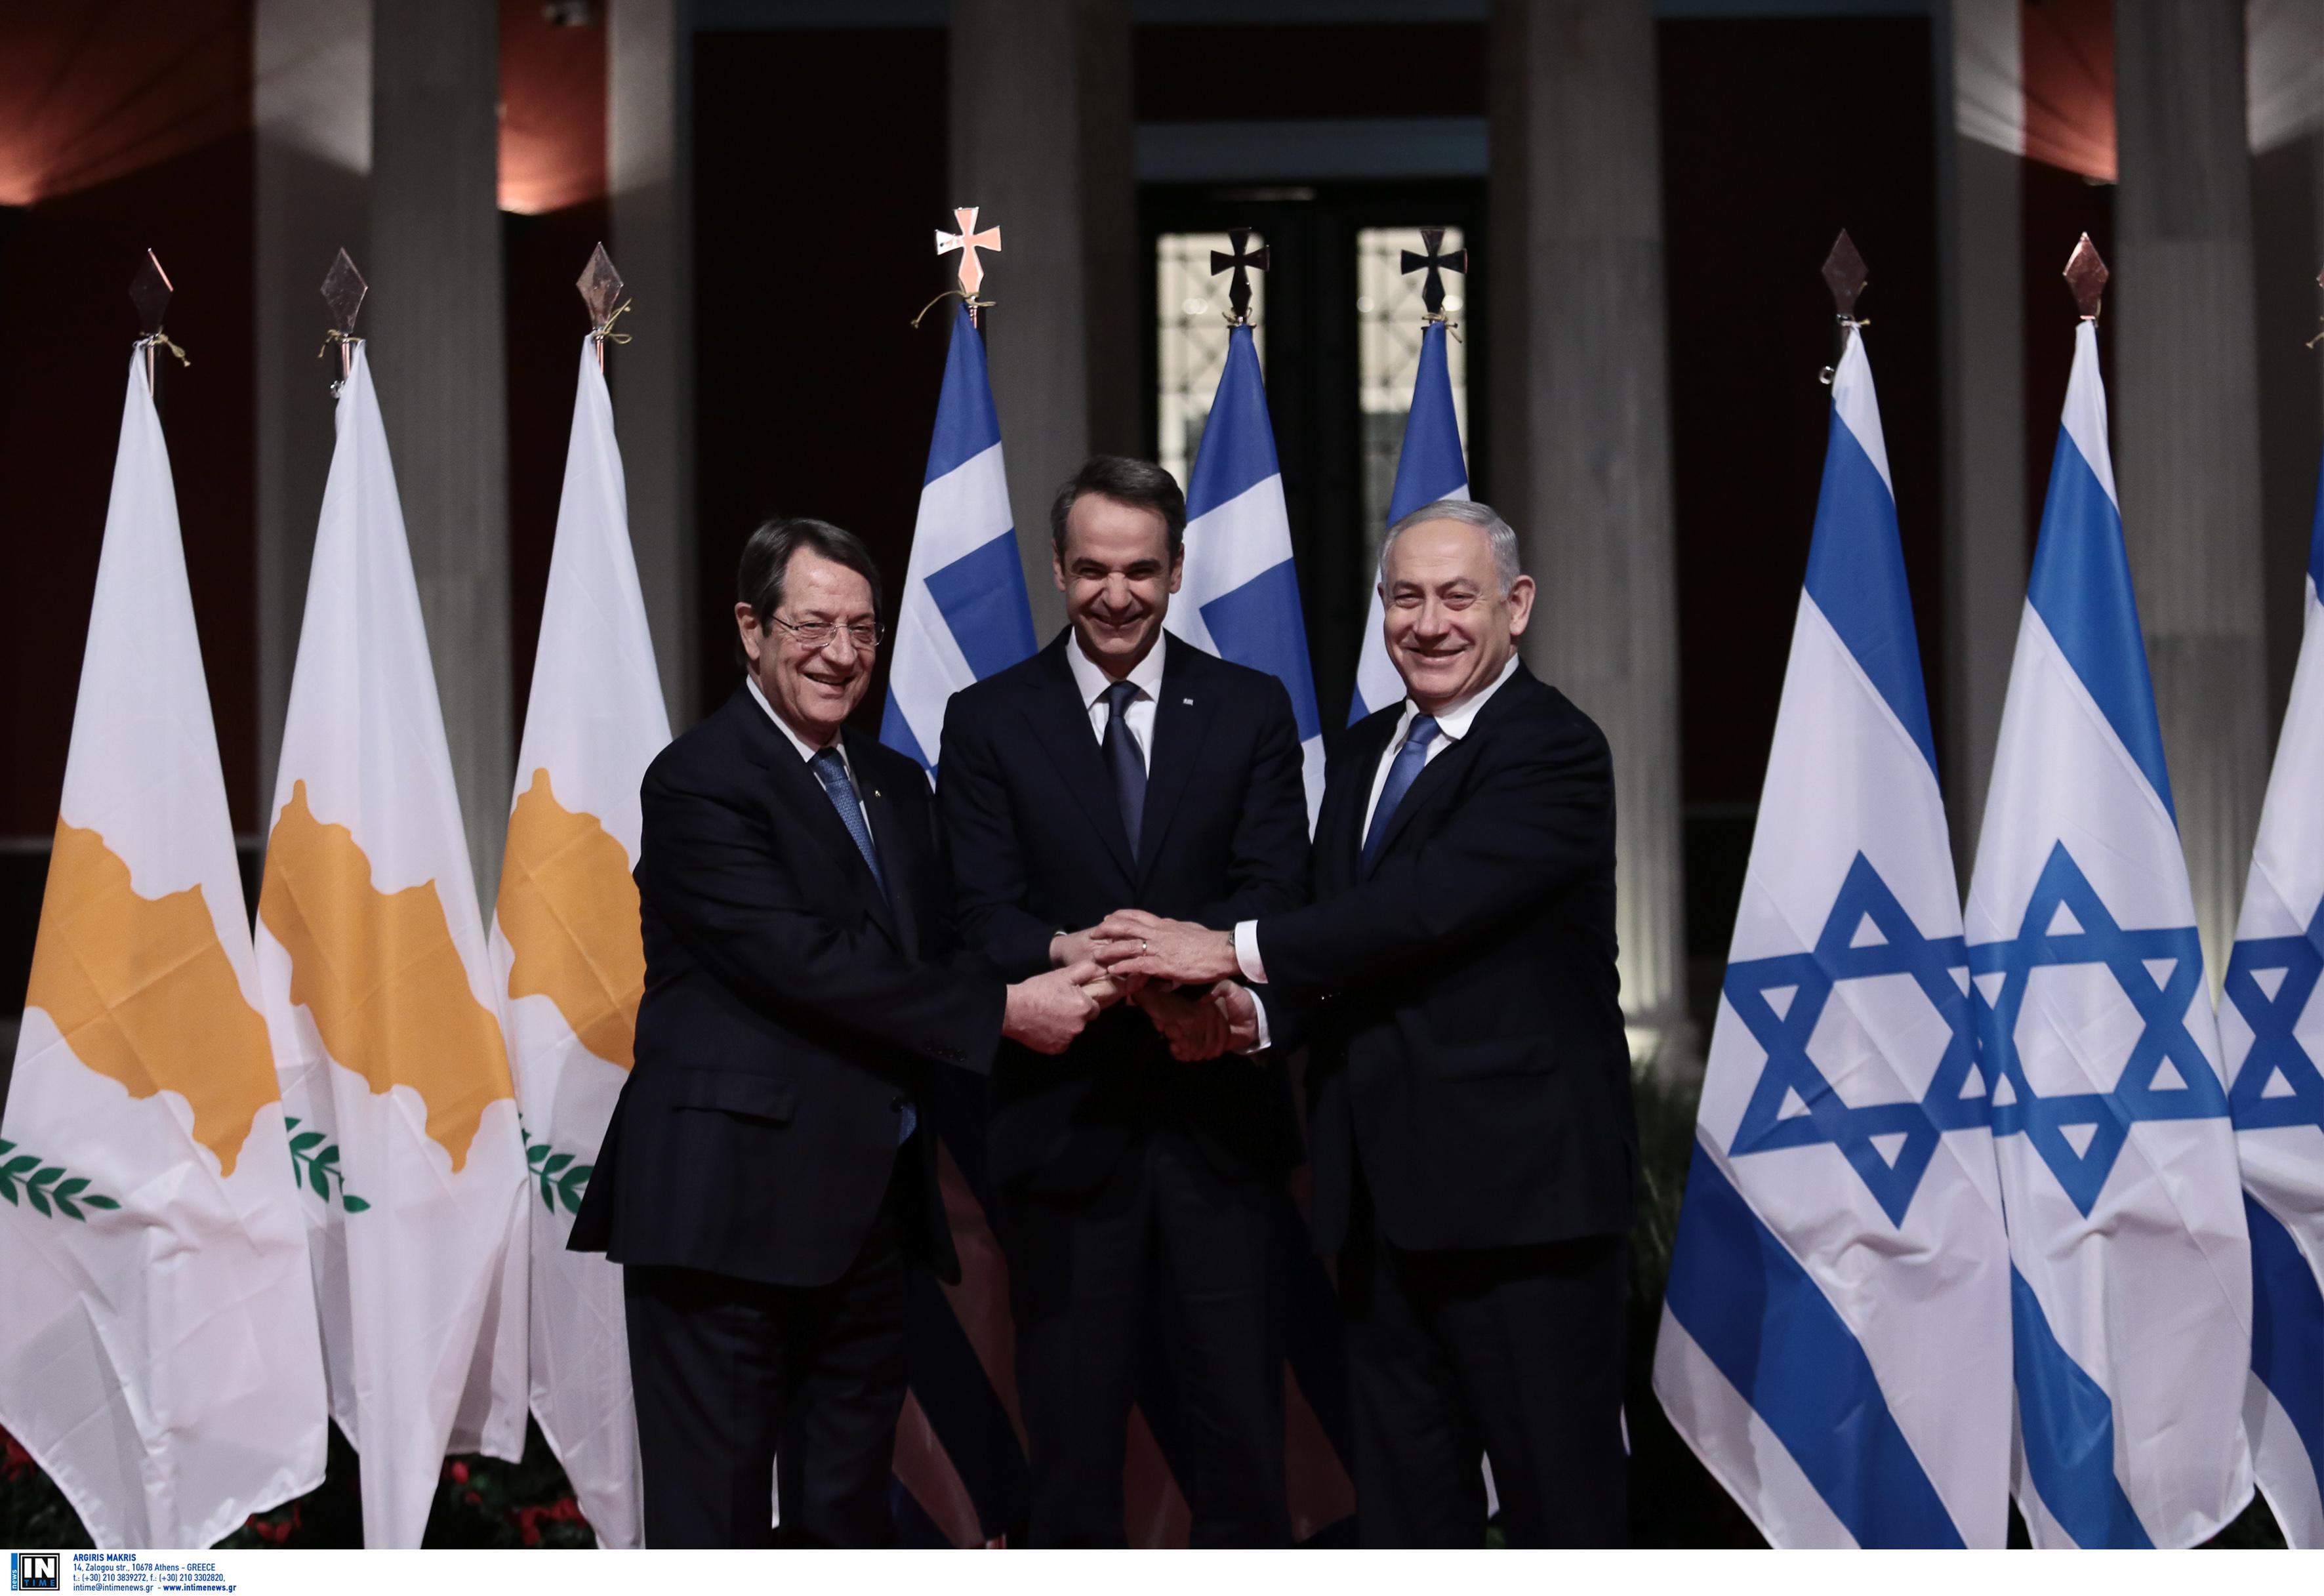 Eastmed: Νέα συμφωνία για διευκόλυνση της μεταφοράς φυσικού αερίου – Ο ρόλος της Ελλάδας